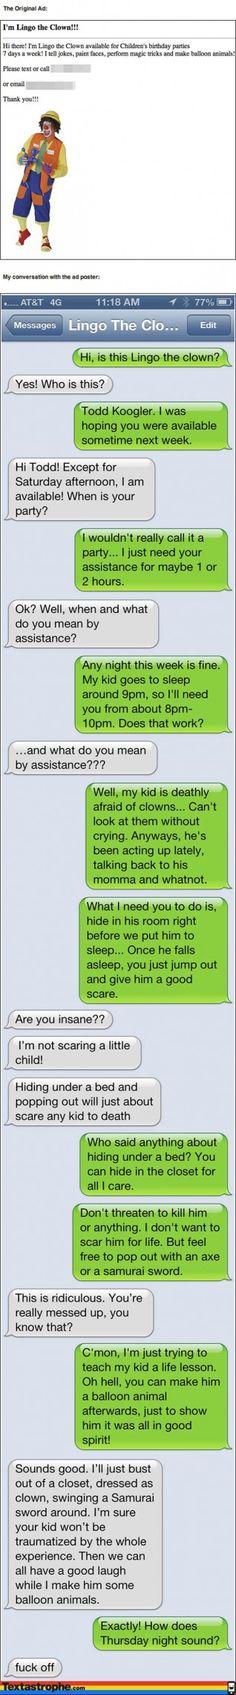 9 funny text message pranks